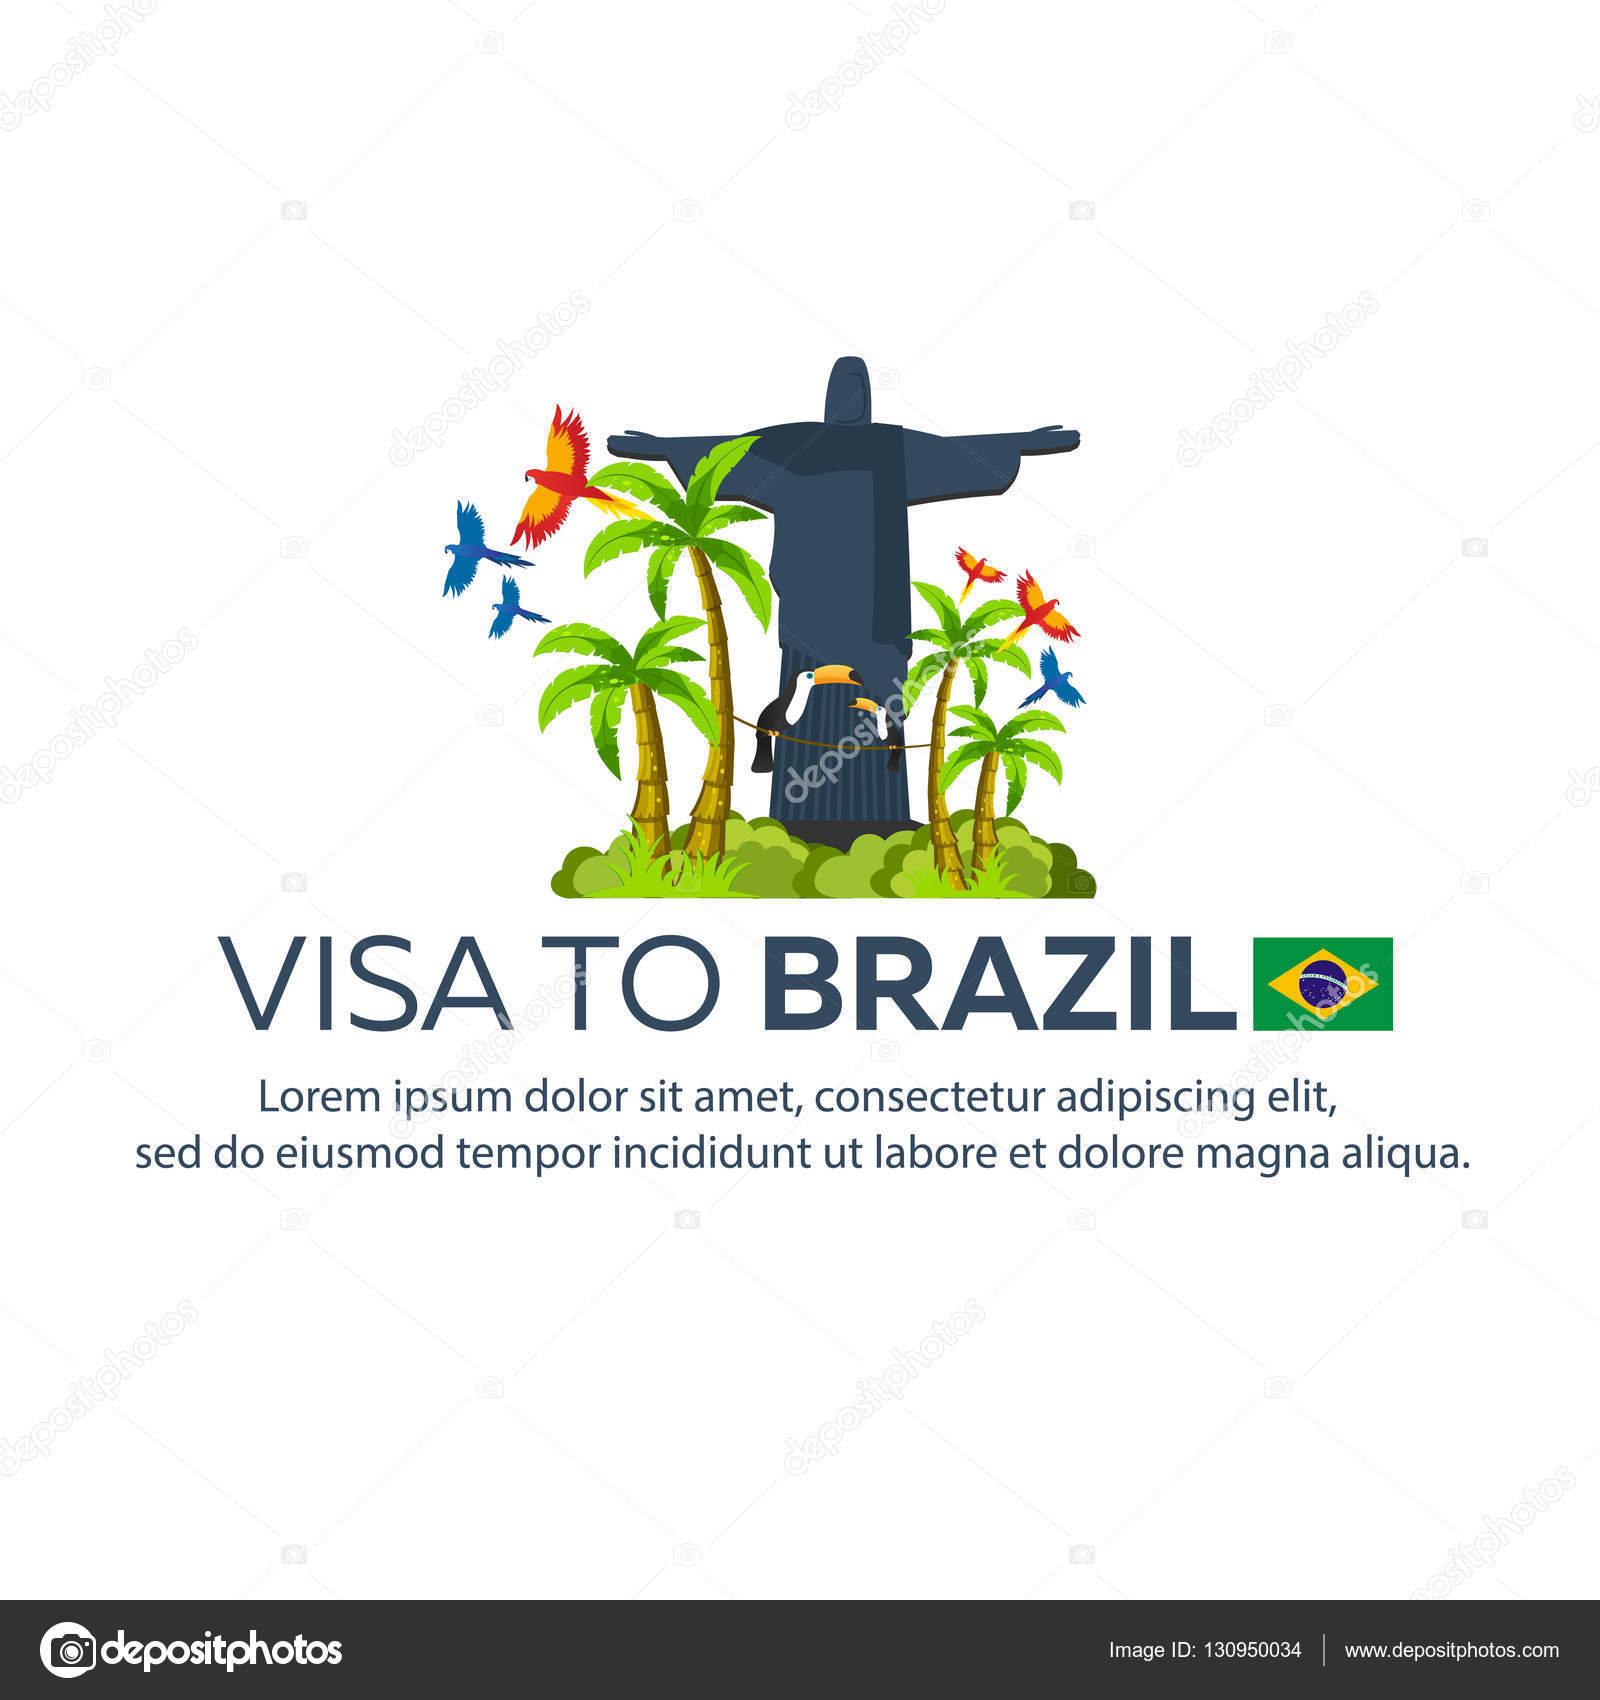 Visa to brazil travel to brazil document for travel vector flat stock illustration visa to brazil travel to brazil document for travel vector flat illustration biocorpaavc Choice Image